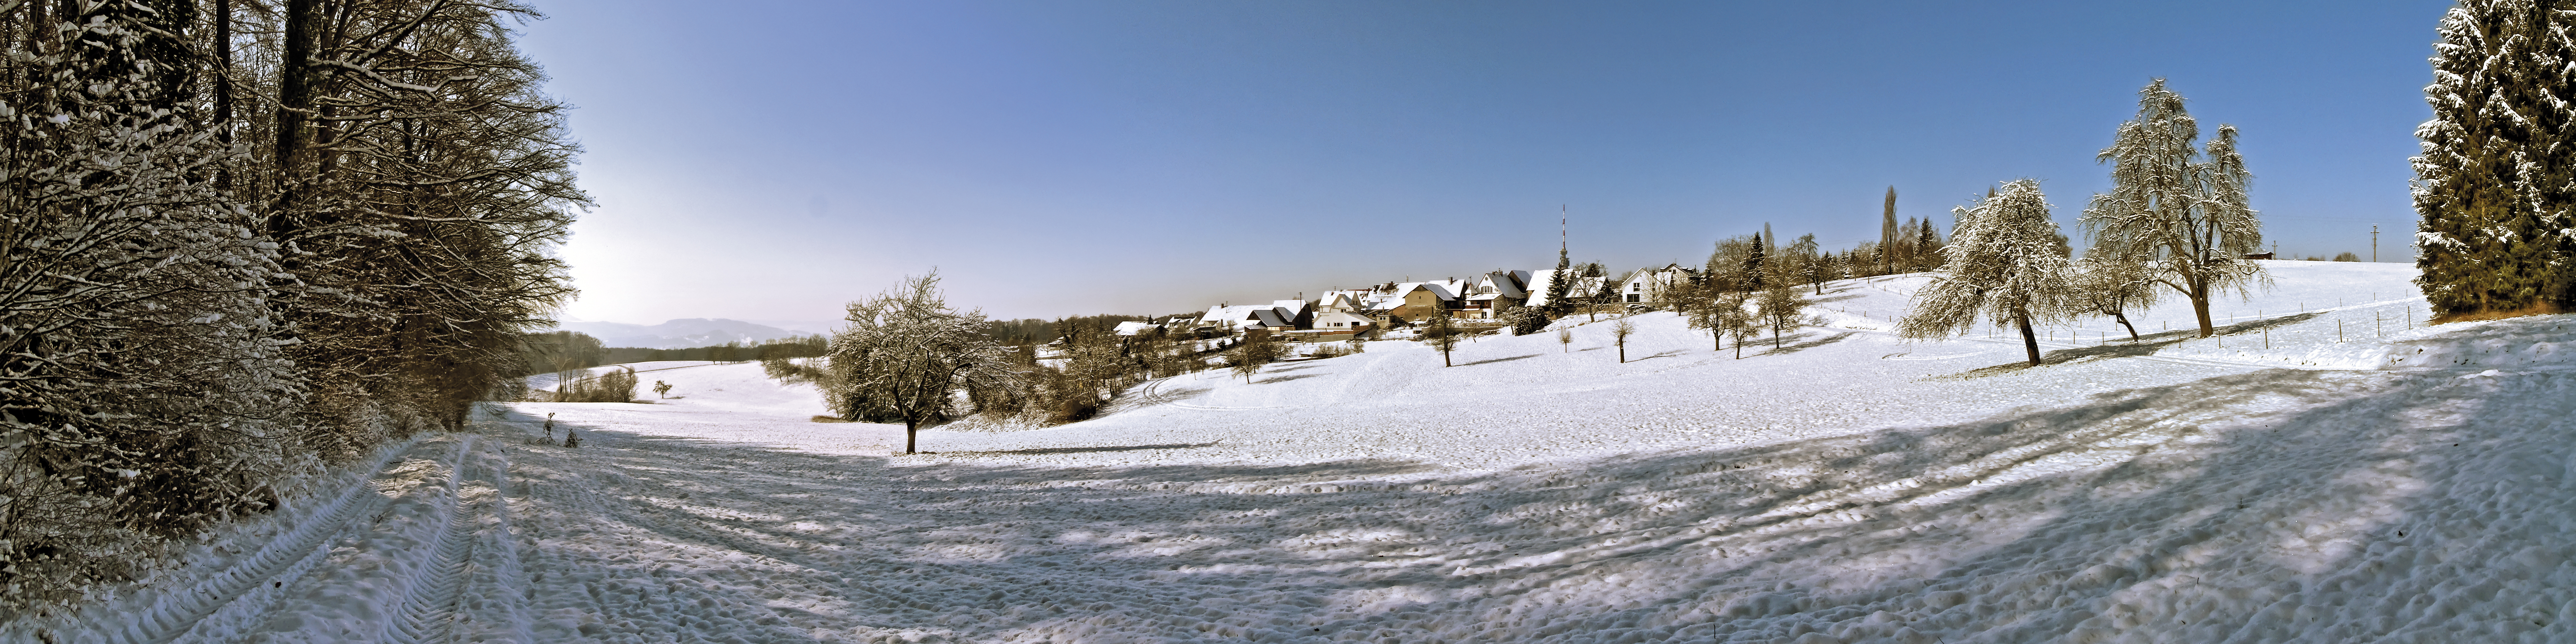 on the Rührberg, Grenzach-Wyhlen